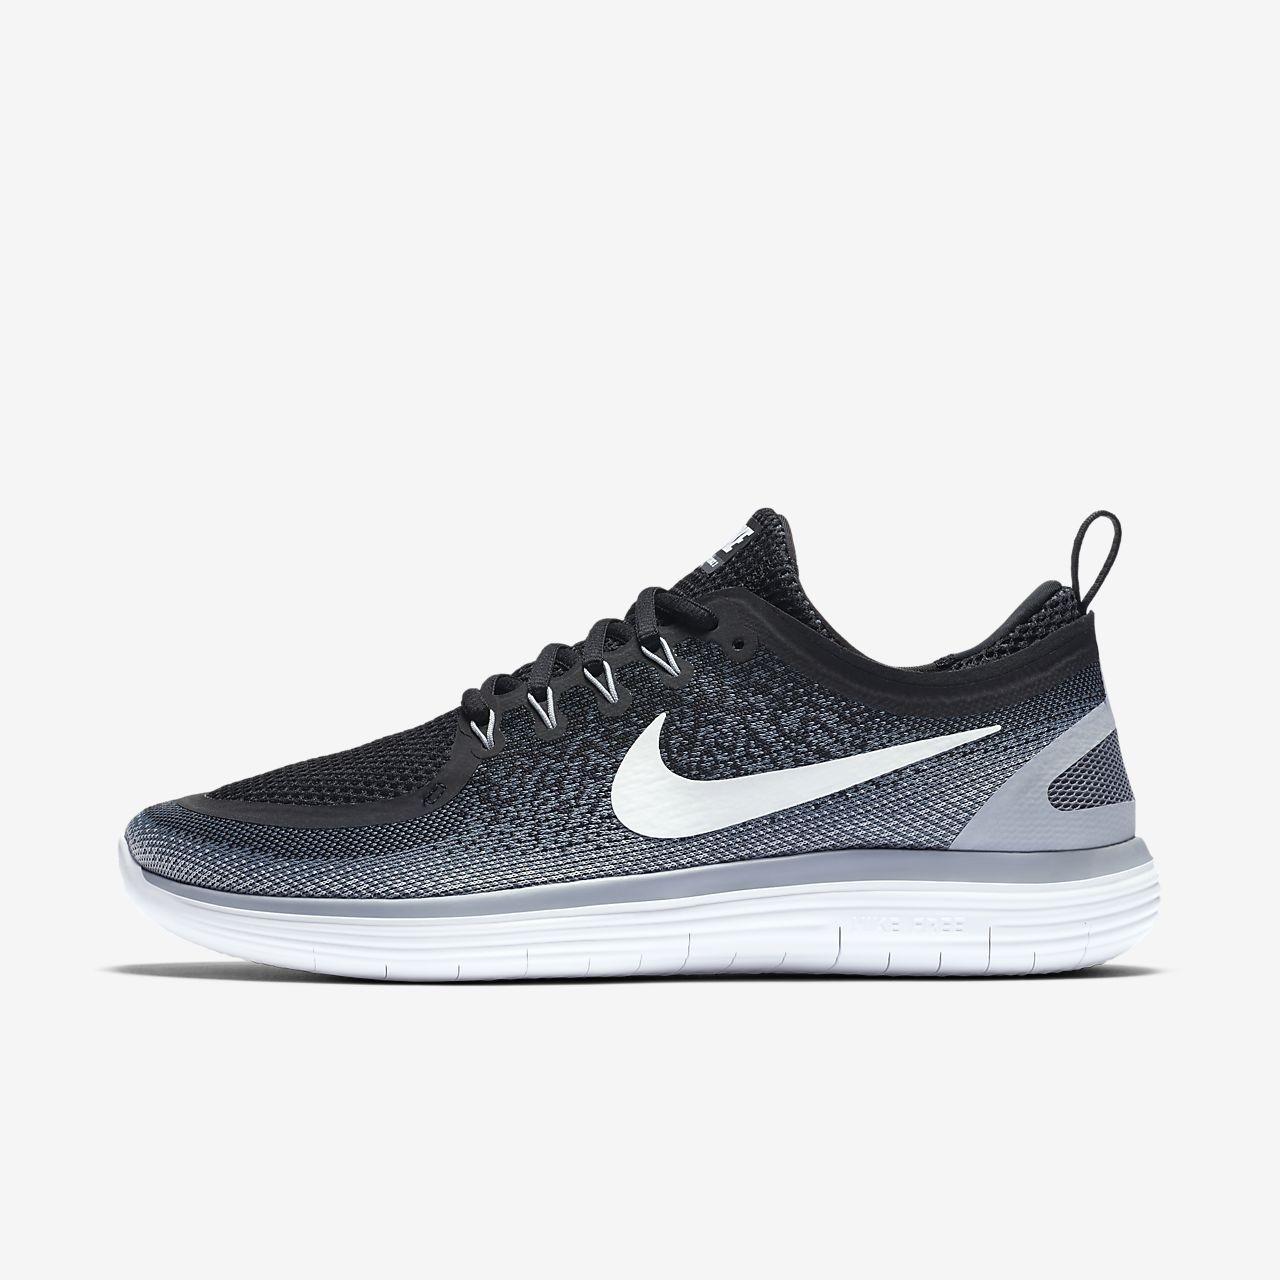 Nike Free run distance 2 femme